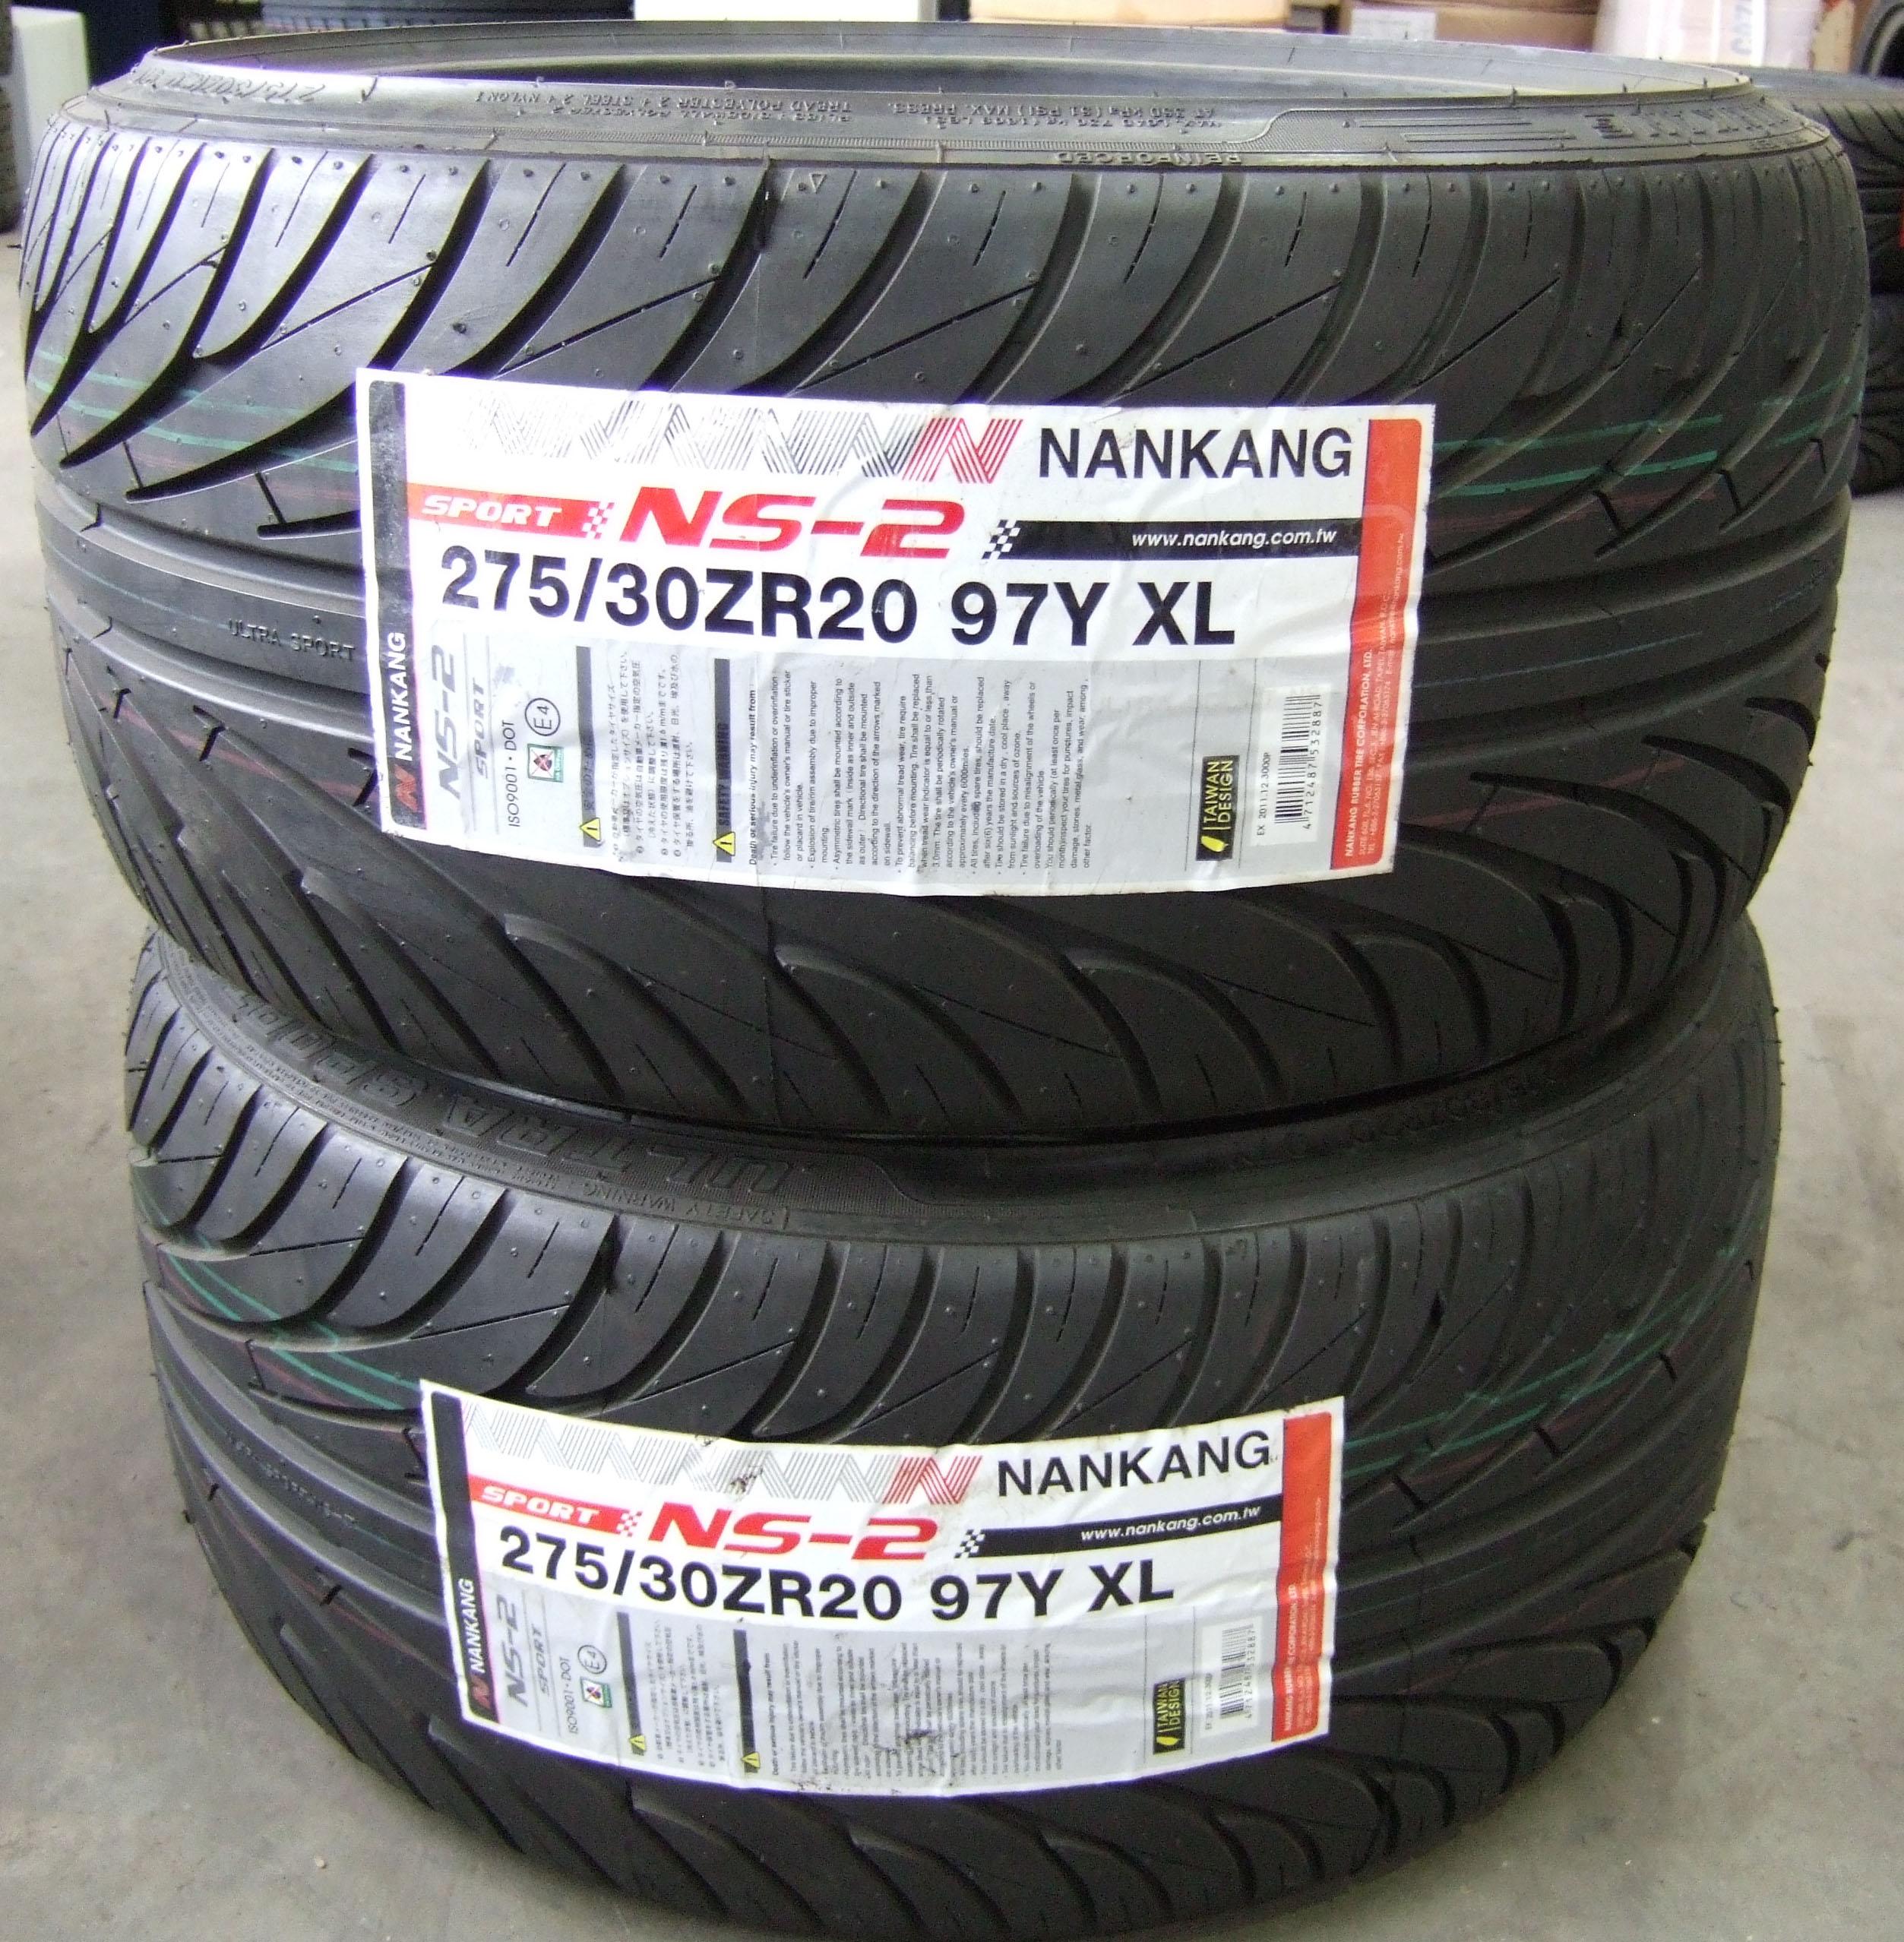 275 30 20 nankang sport ns2 tyres 2753020 97y xl 275 30 20. Black Bedroom Furniture Sets. Home Design Ideas